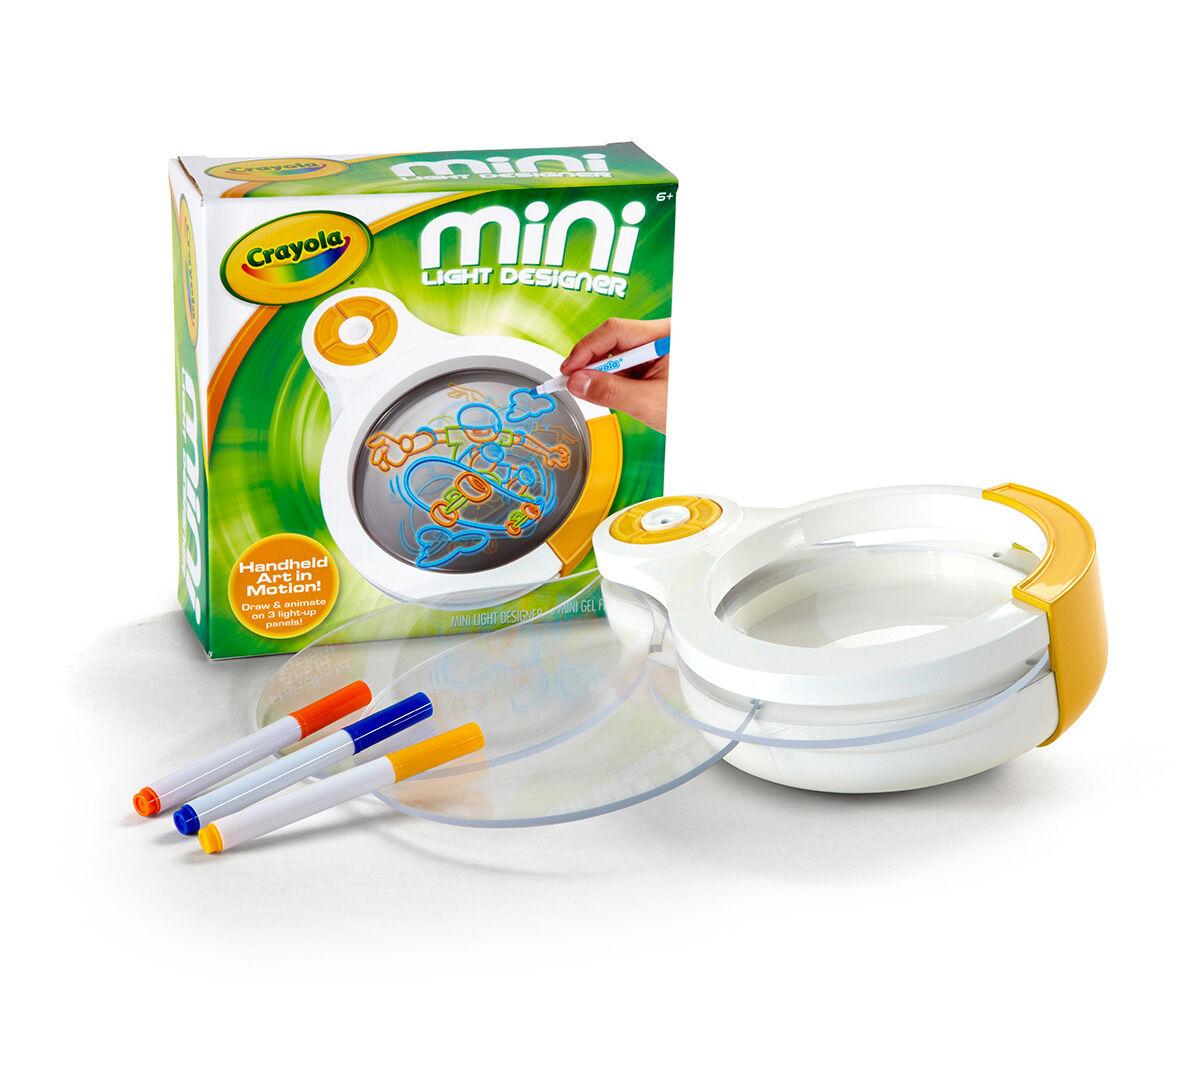 mini light designer | buy crayola's light design at crayola